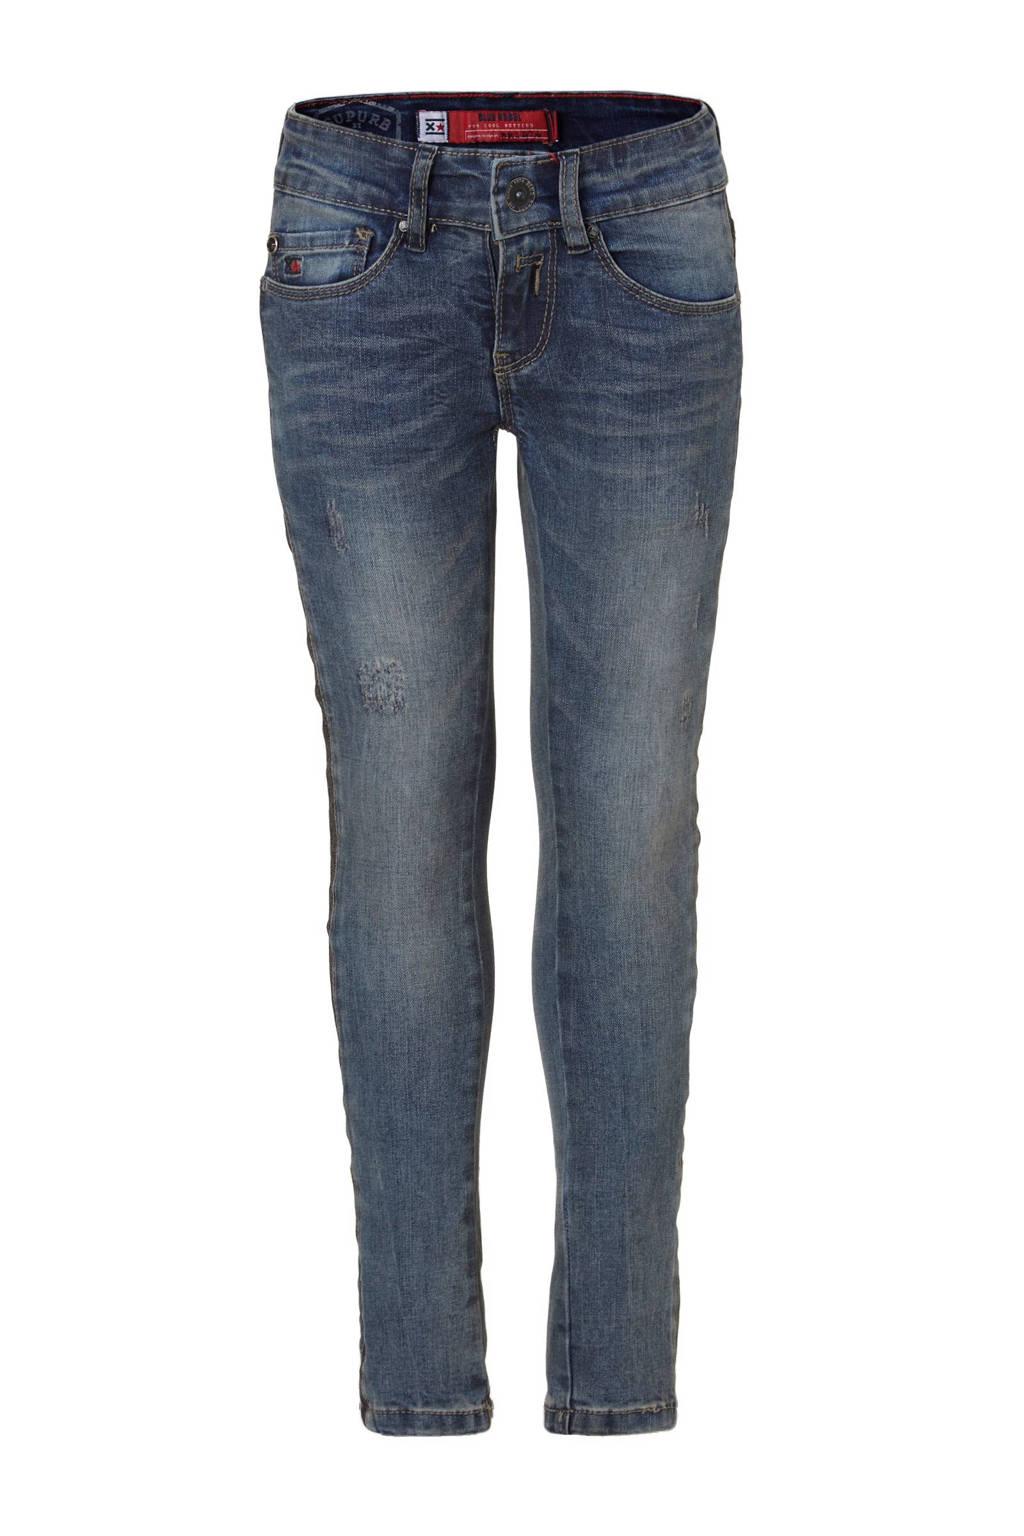 Blue Rebel Saphire ultra skinny fit jeans, Dawn wash